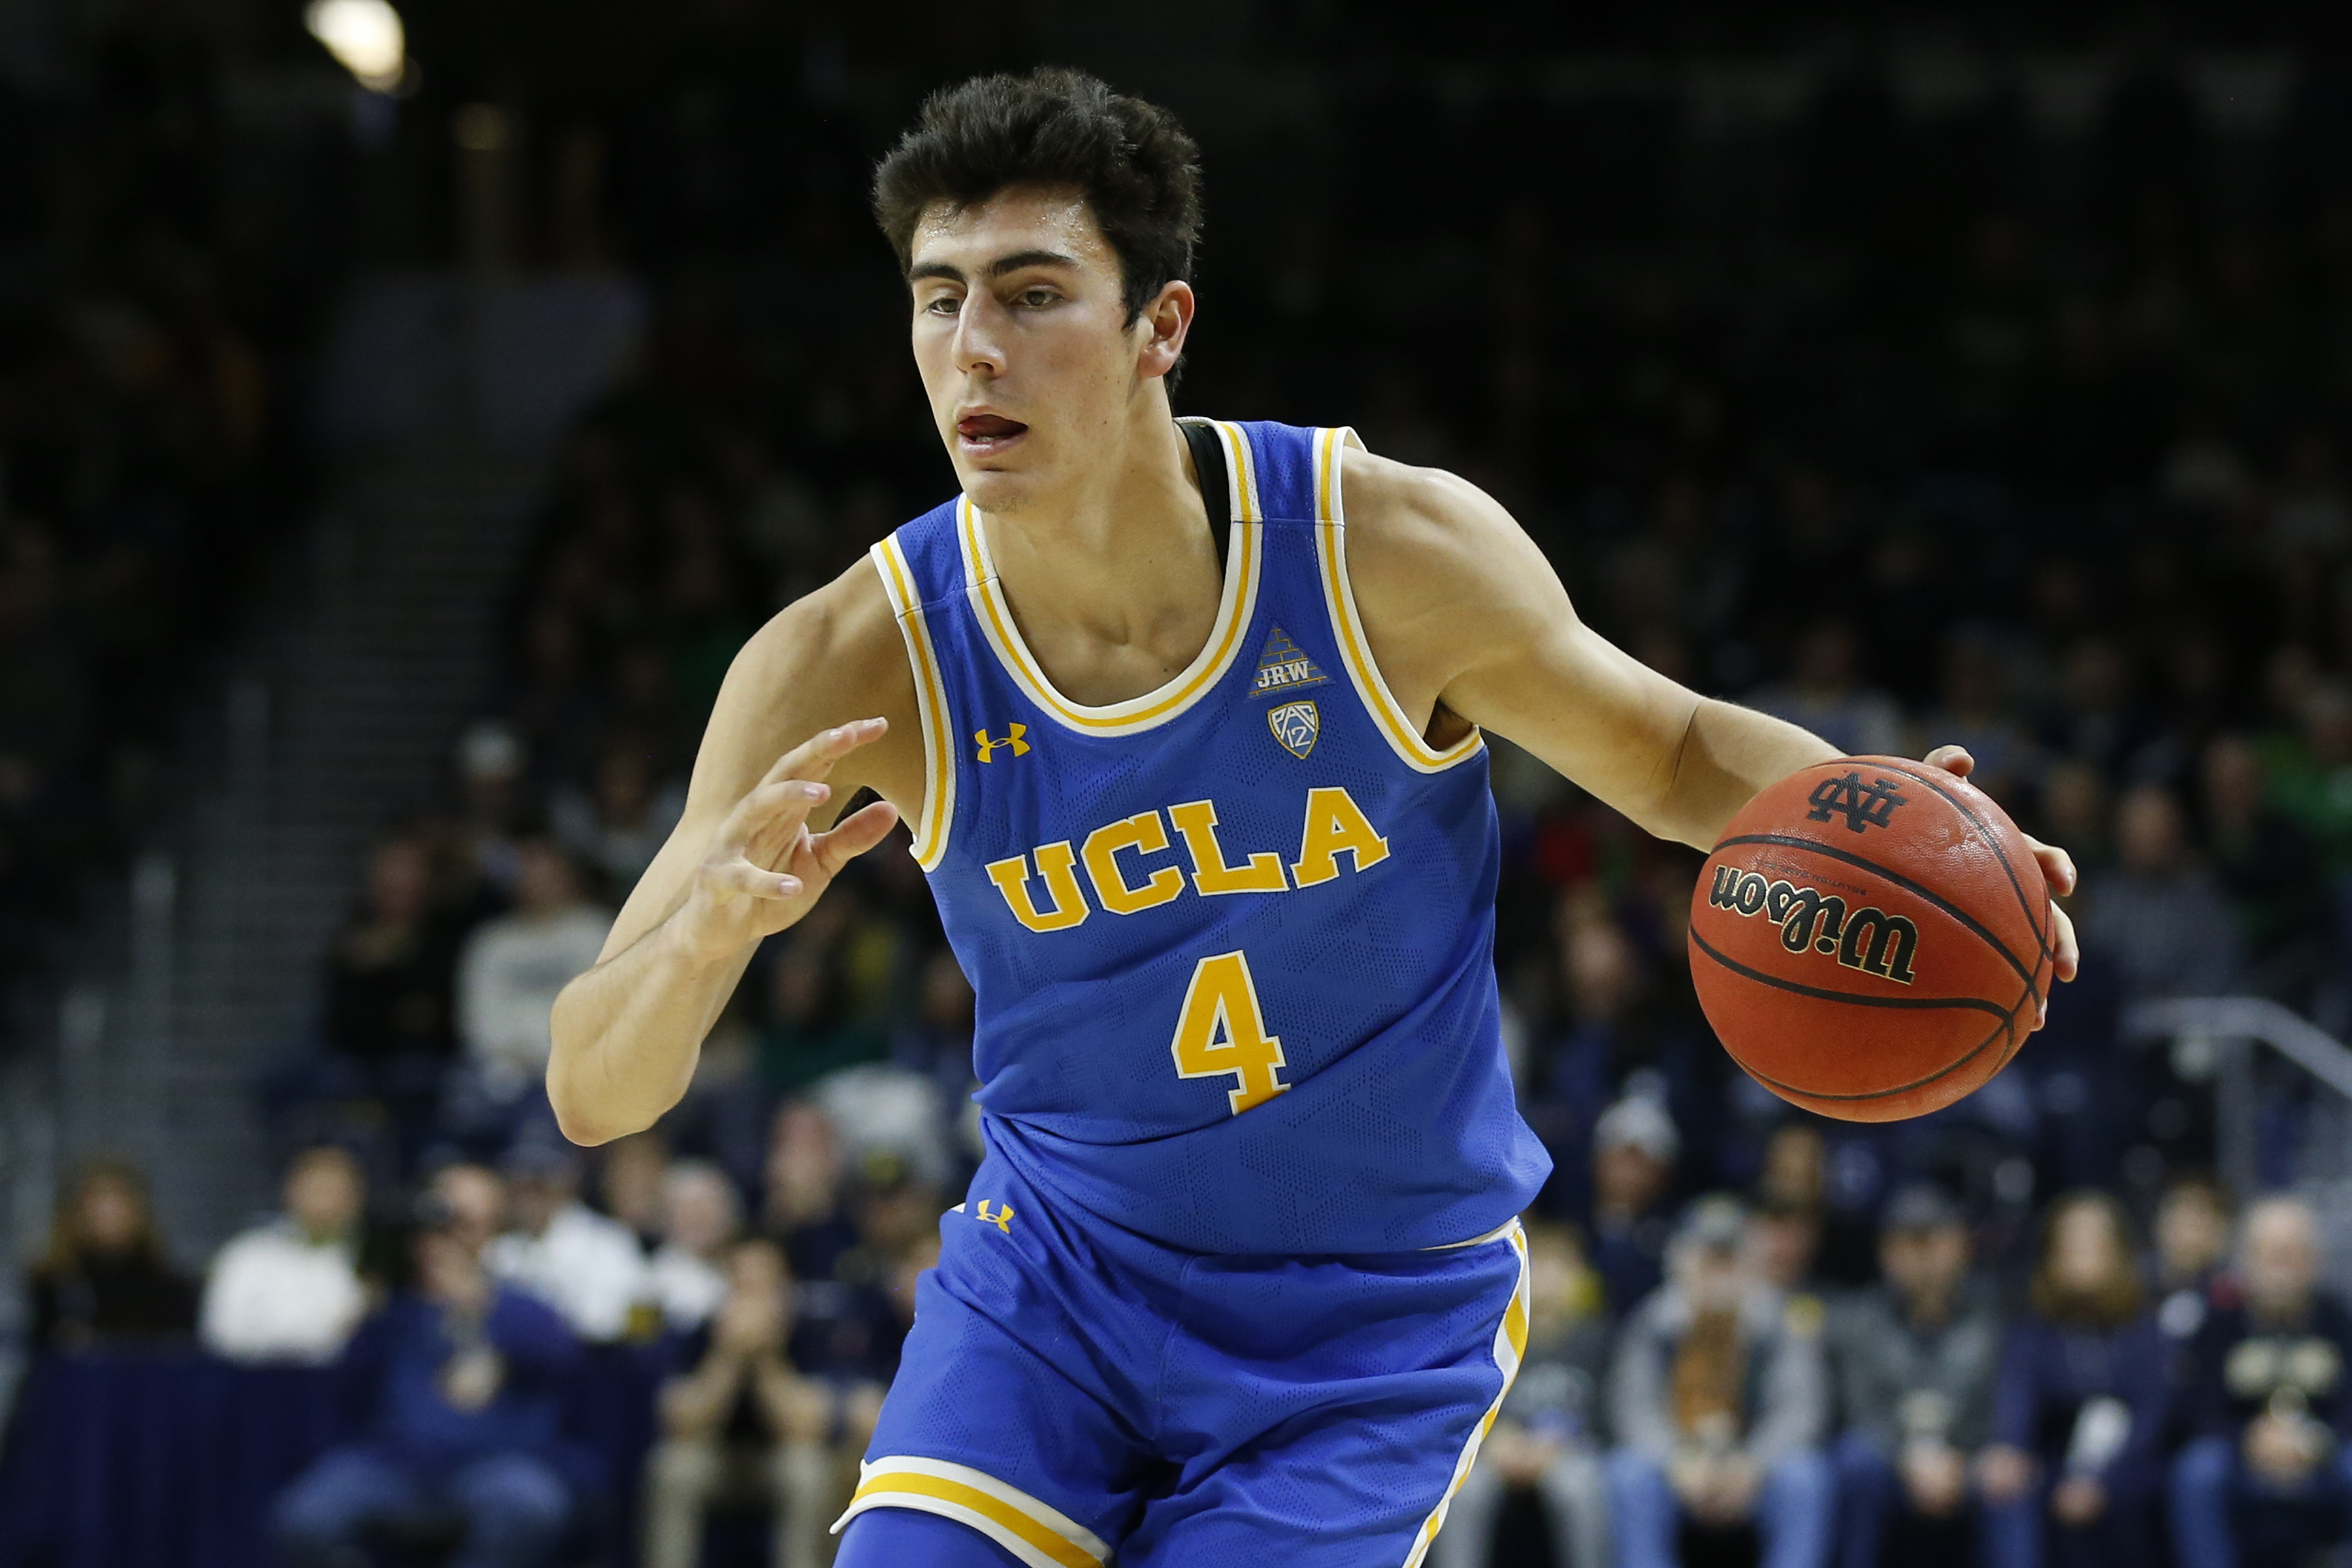 COLLEGE BASKETBALL: DEC 14 UCLA at Notre Dame